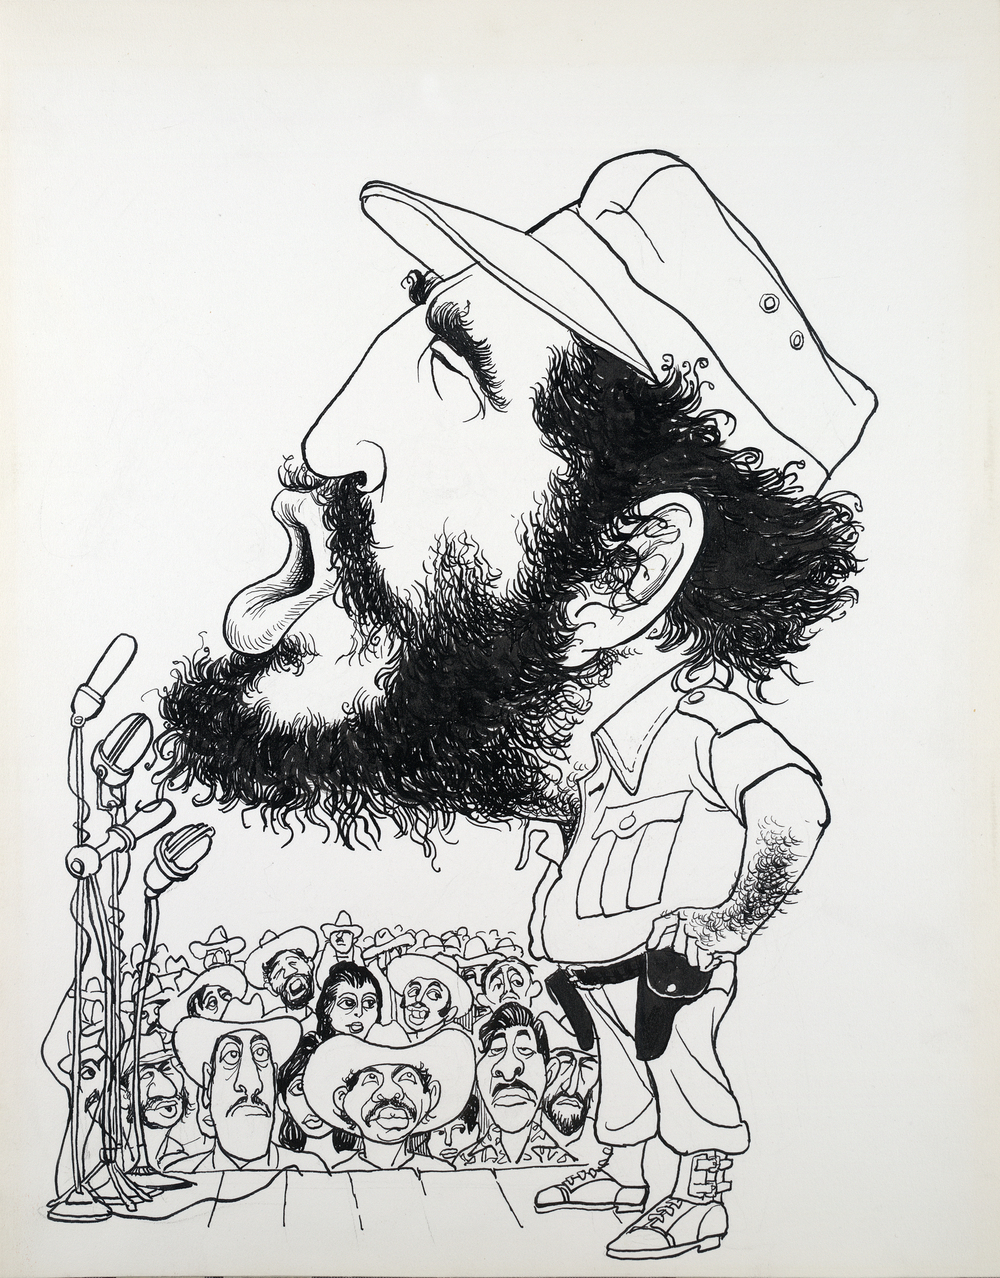 Fidel_Castro_by_Edmund_S._Valtman_ppmsc.07956.jpg